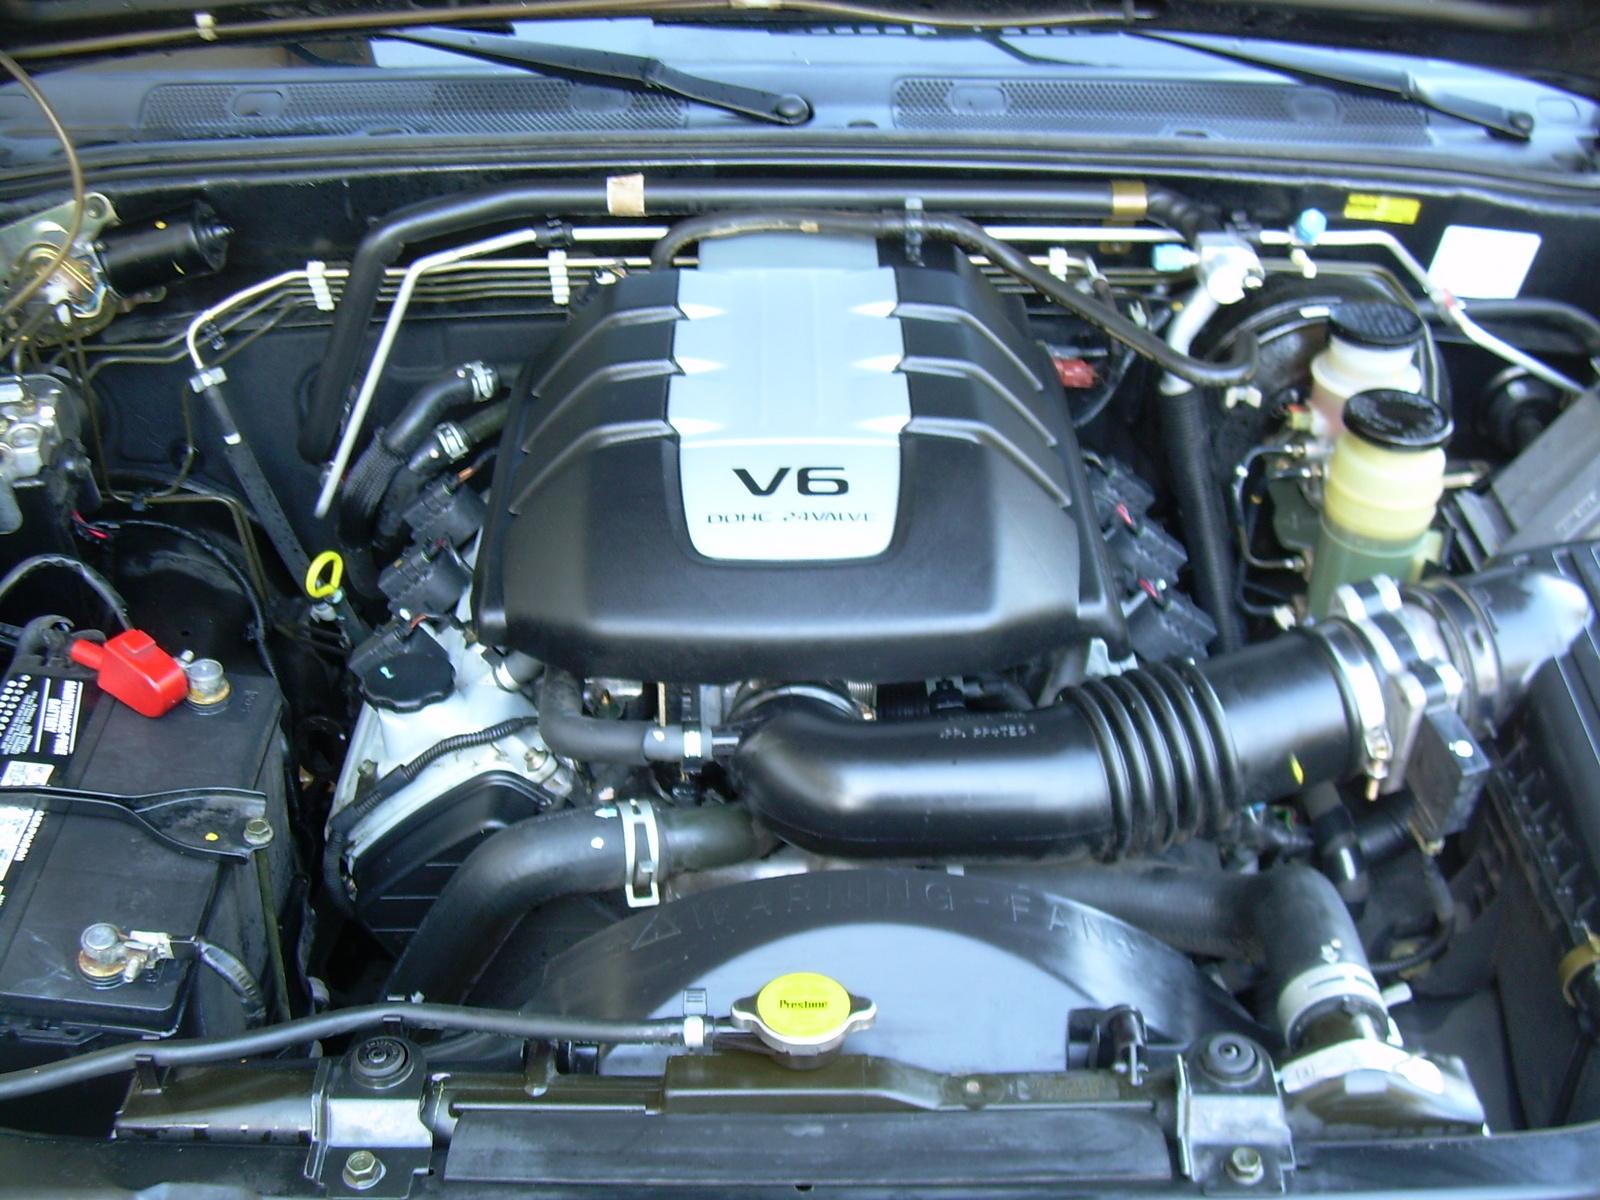 2002 isuzu rodeo engine diagram example uml 2 timing service manual how to remove 2000